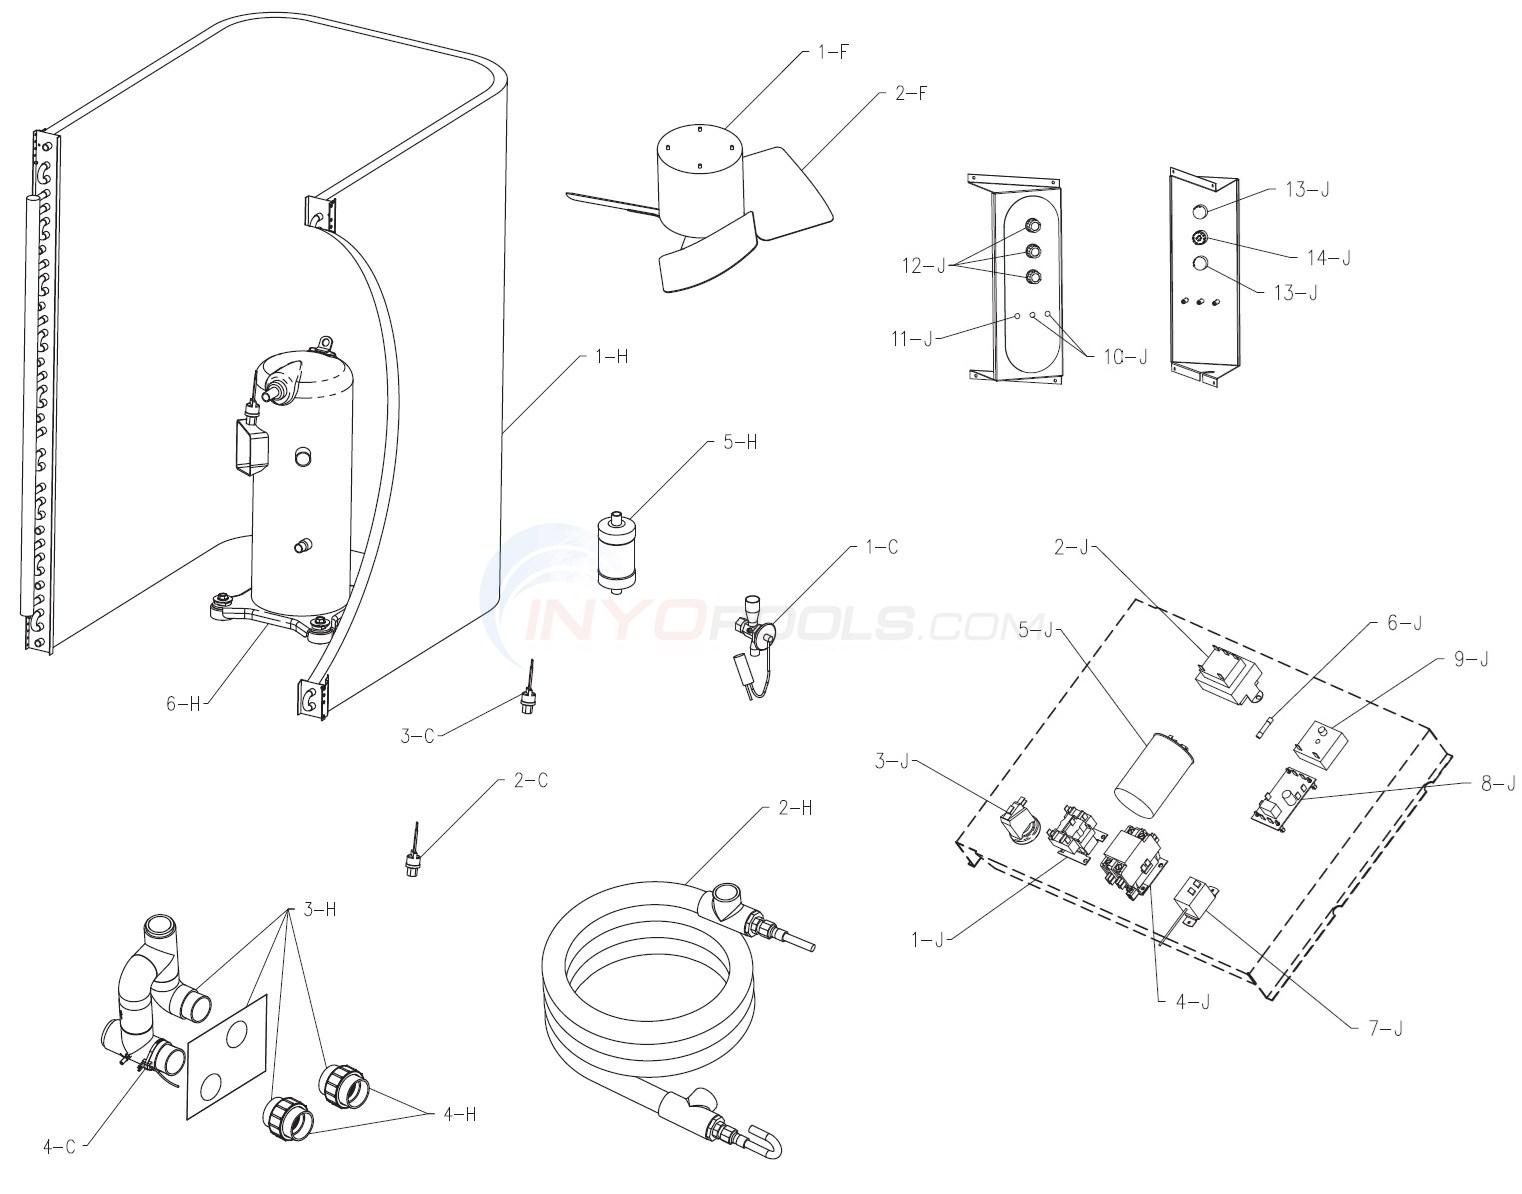 York Ac Schematics Df 072 Archive Of Automotive Wiring Diagram Predator Trusted Diagrams Rh Kroud Co